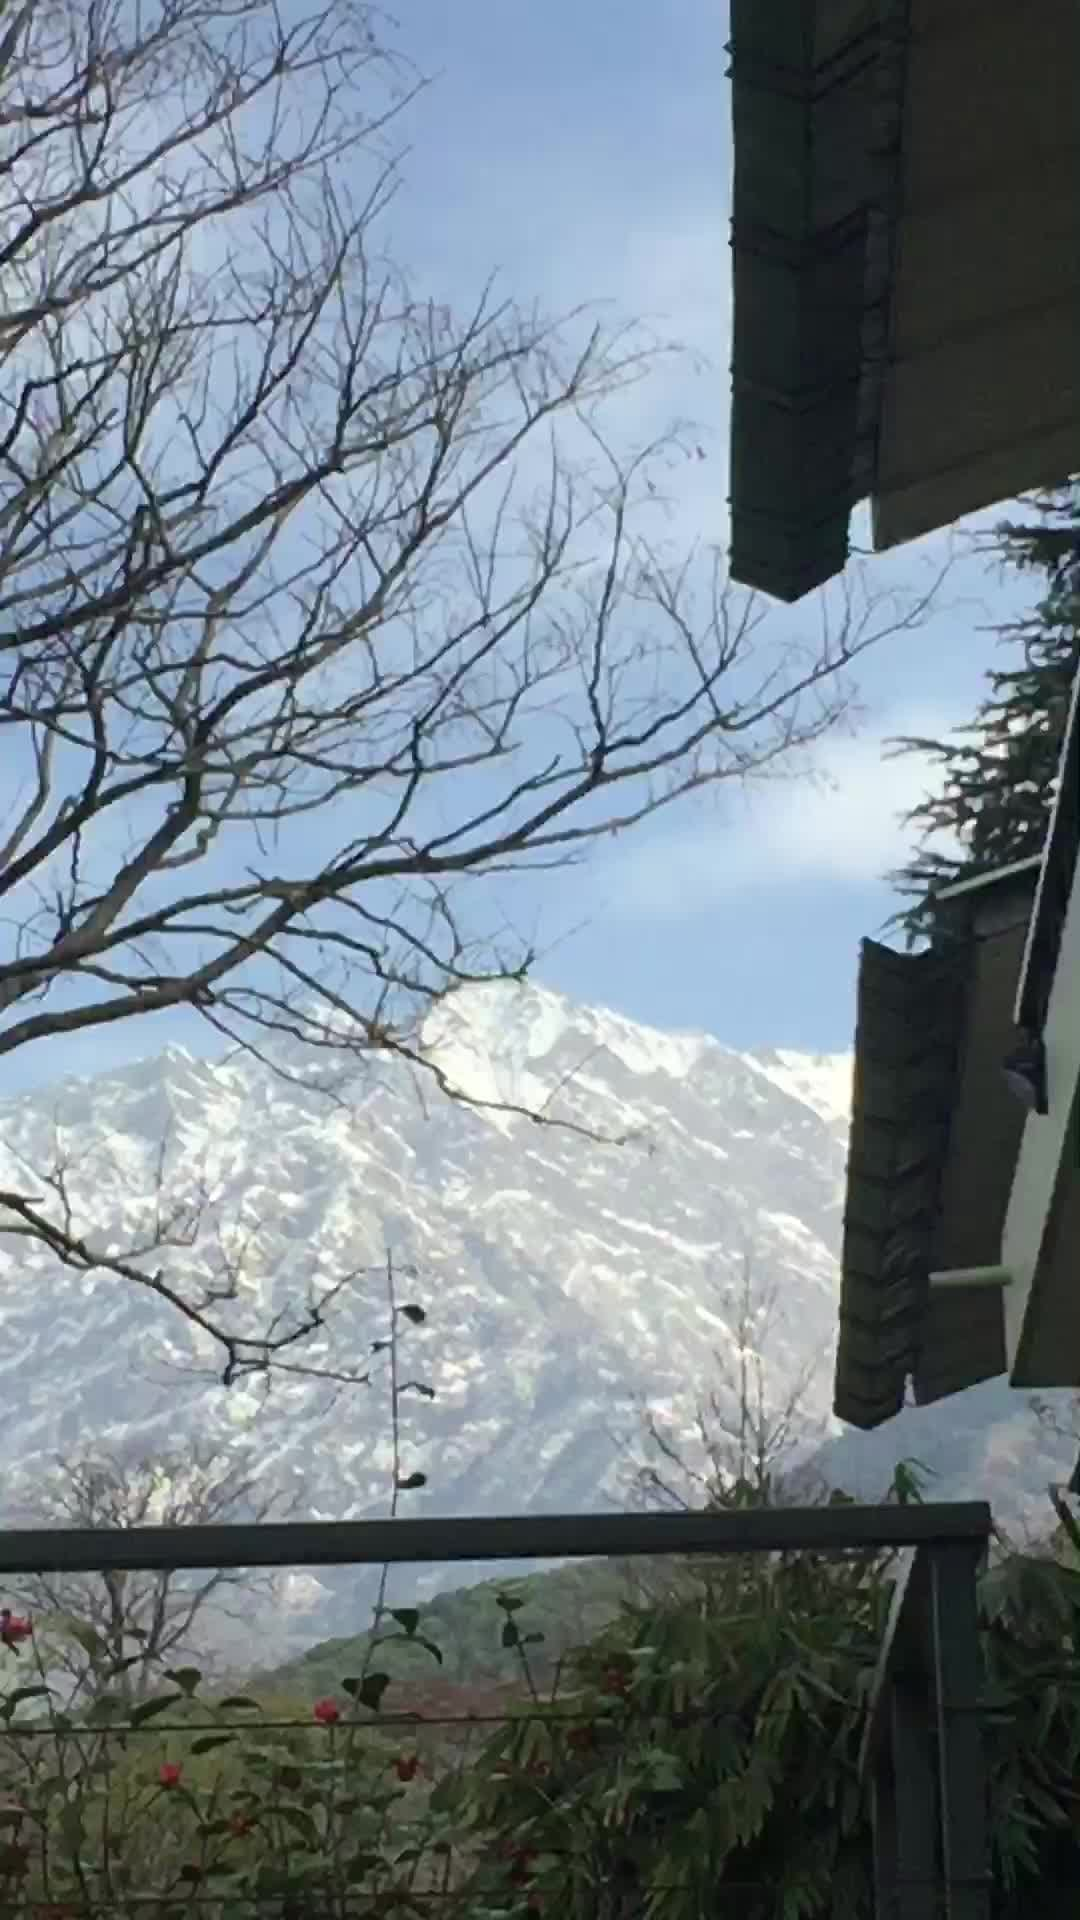 Dhauladhar mountain range view fromThe Norwood  Greens resort.